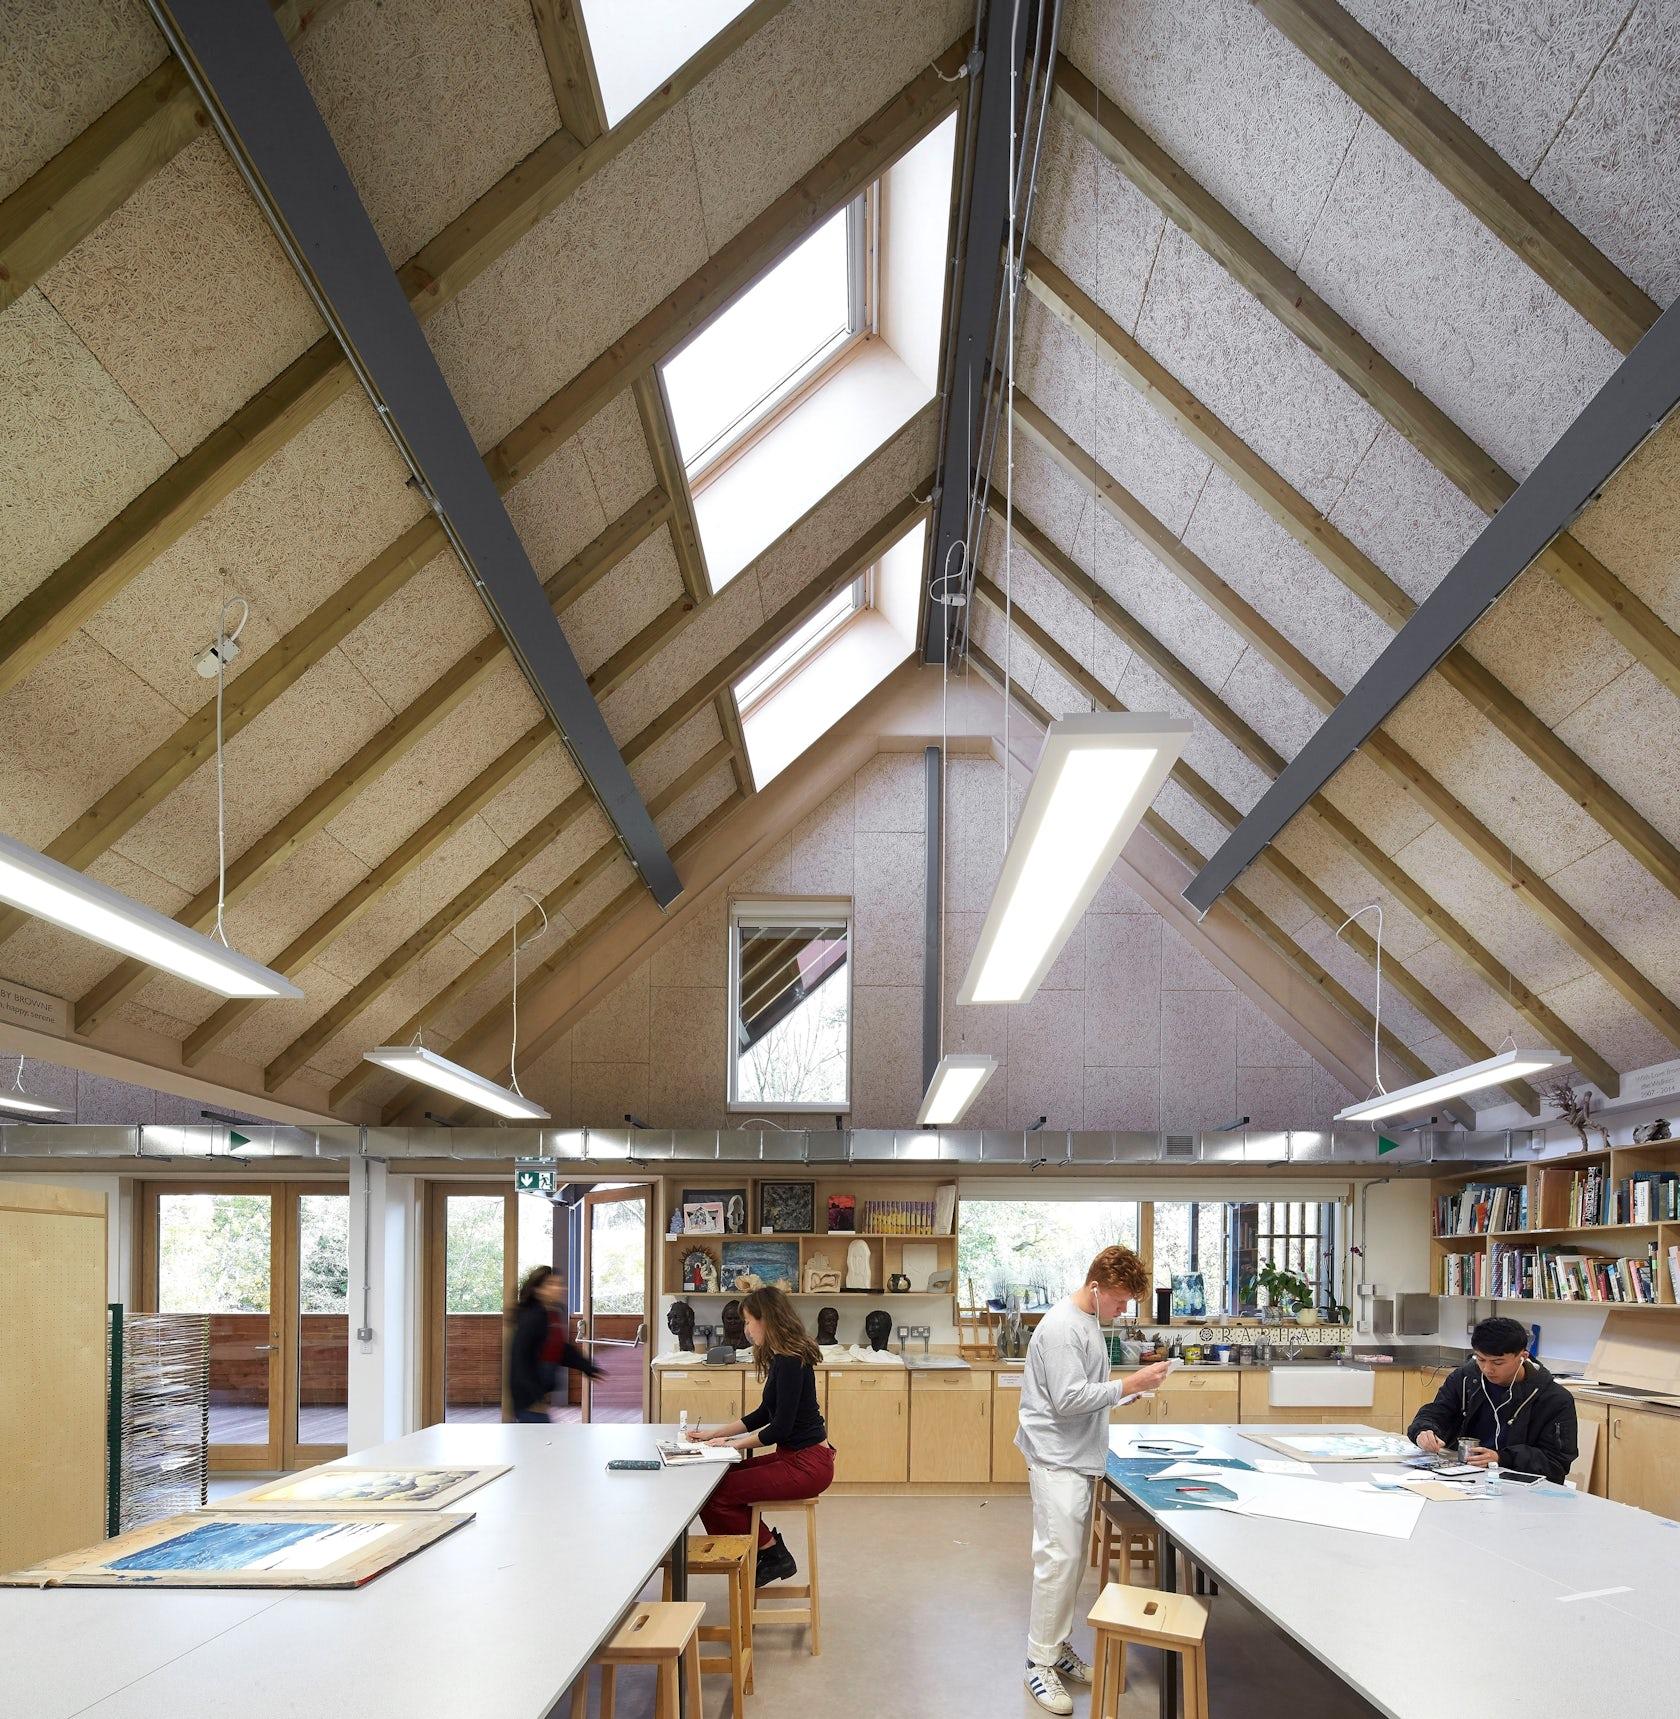 bedales architecture building clegg feilden bradley studios crow hufton barn creates education architizer inspired north studio walkway canopy timber dezeen